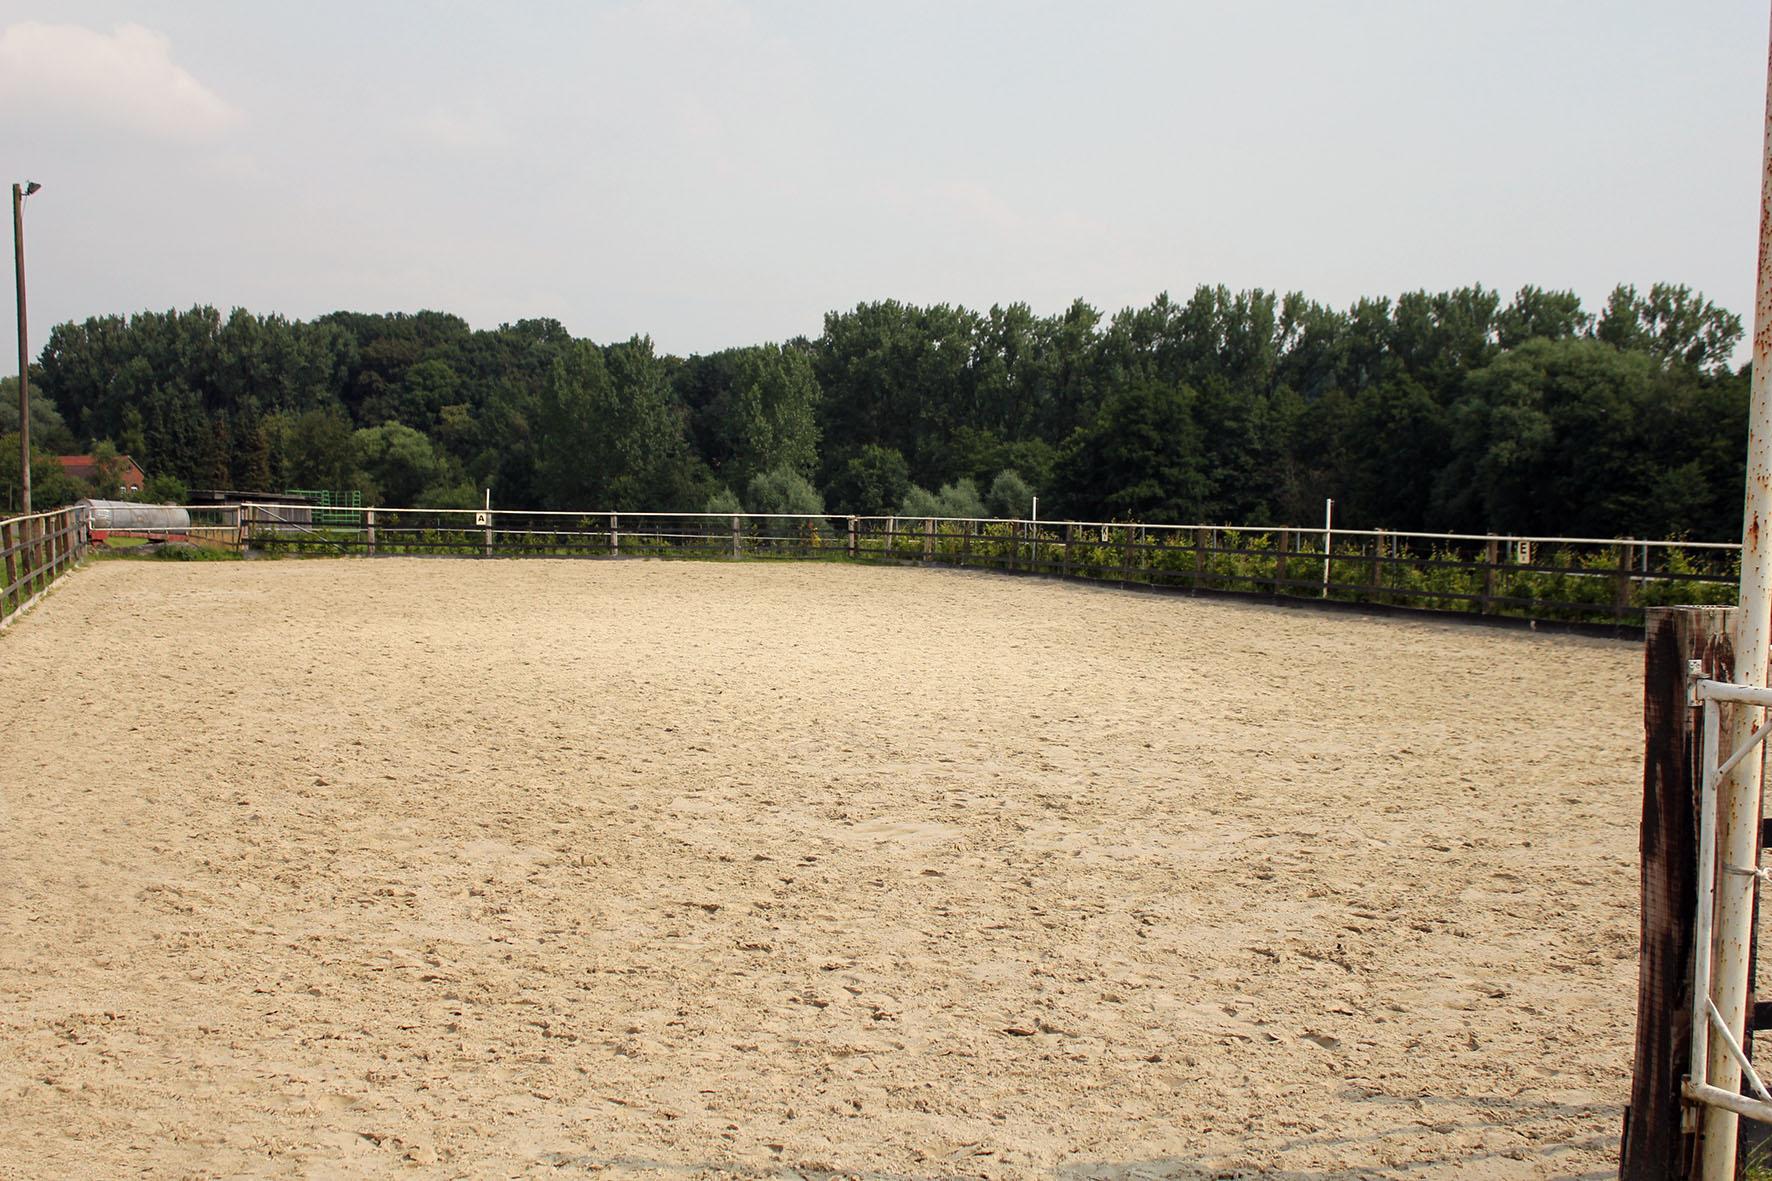 Allwetterreitplatz 20 x 50m